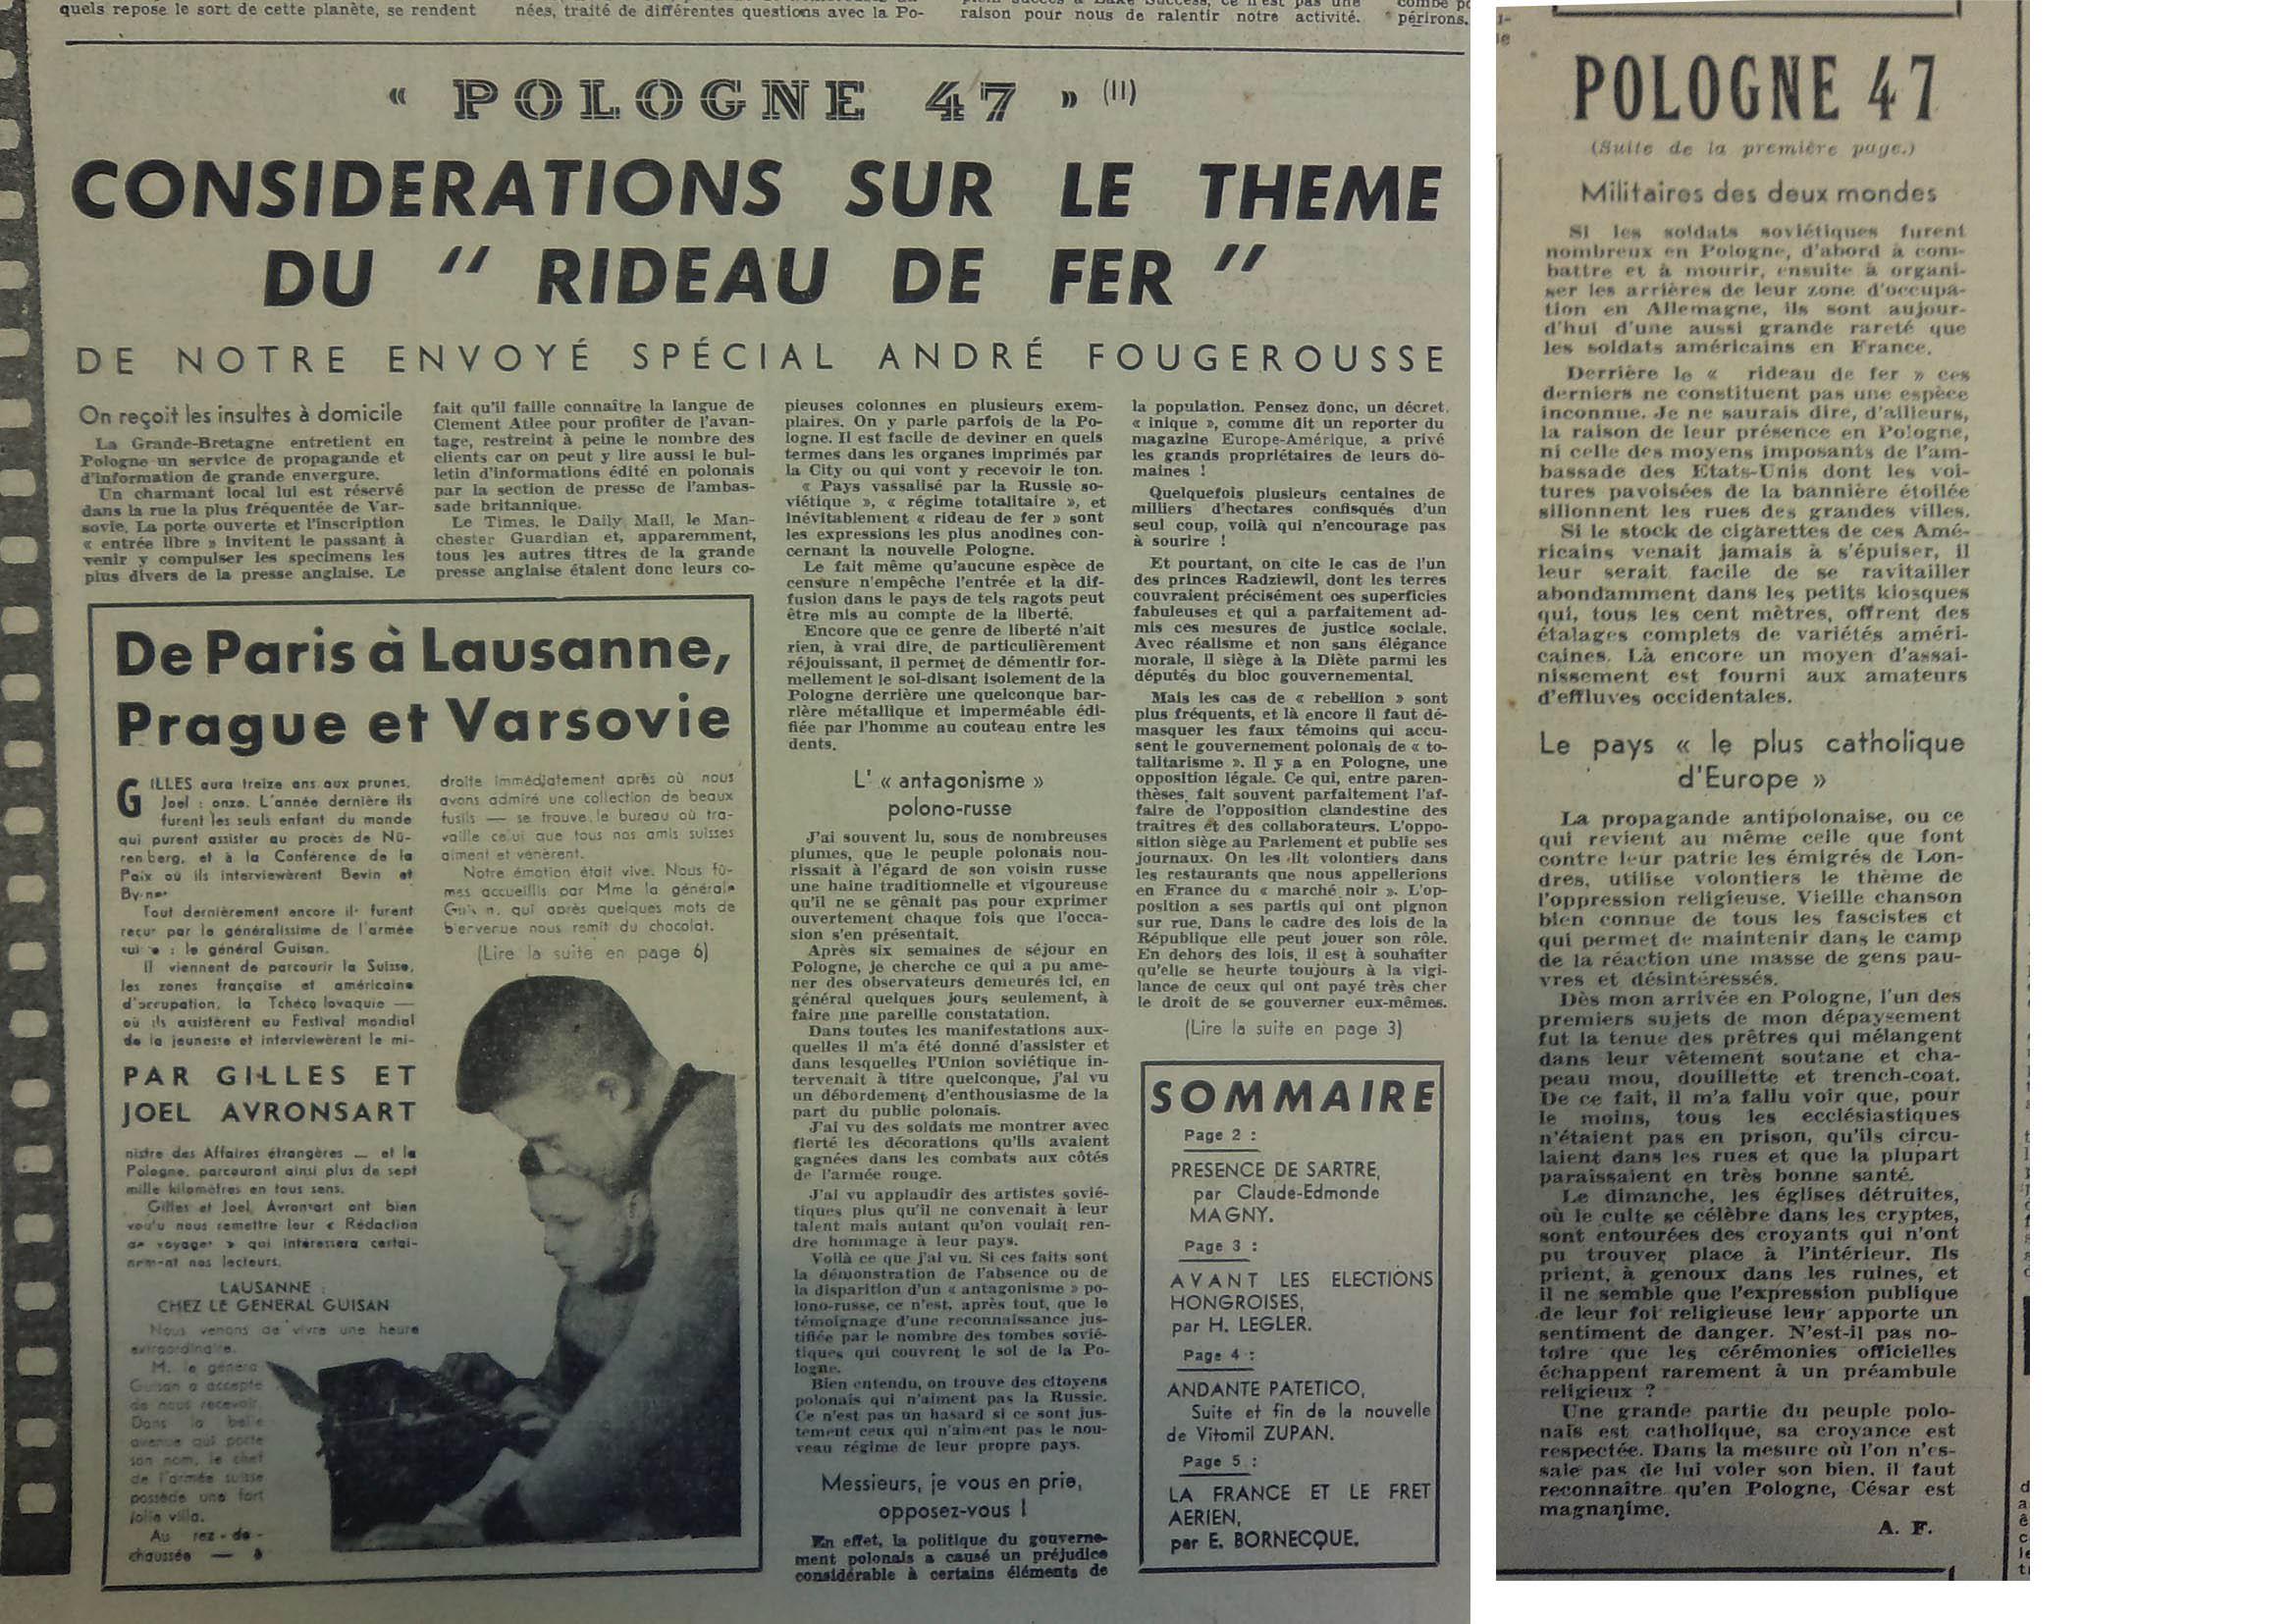 P50 N°57 30 août 1947 fusion